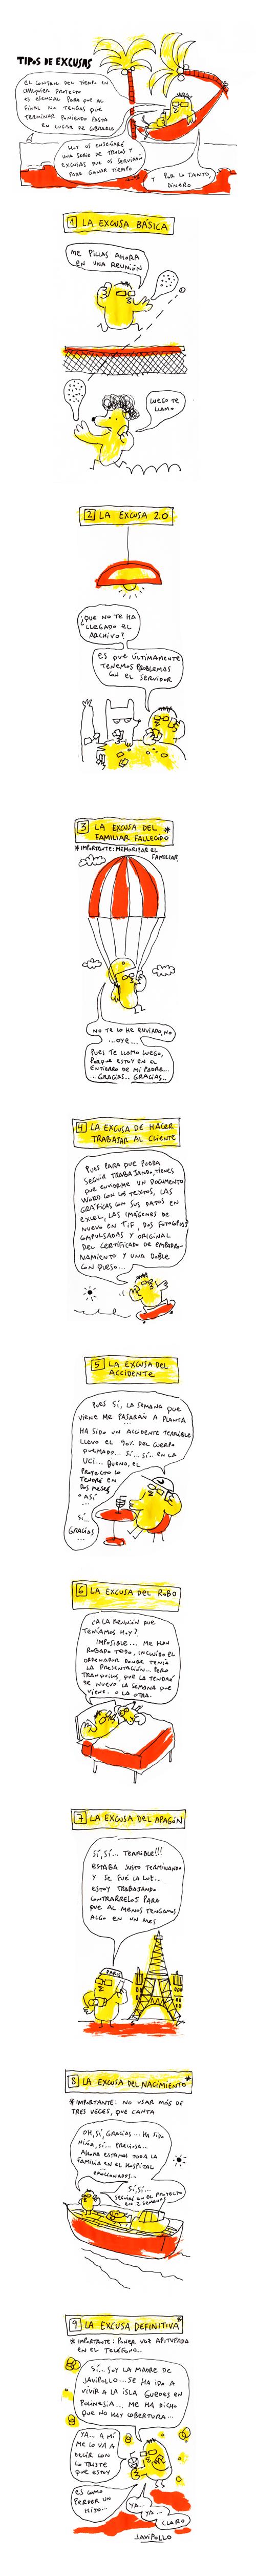 javipollo_excusas1